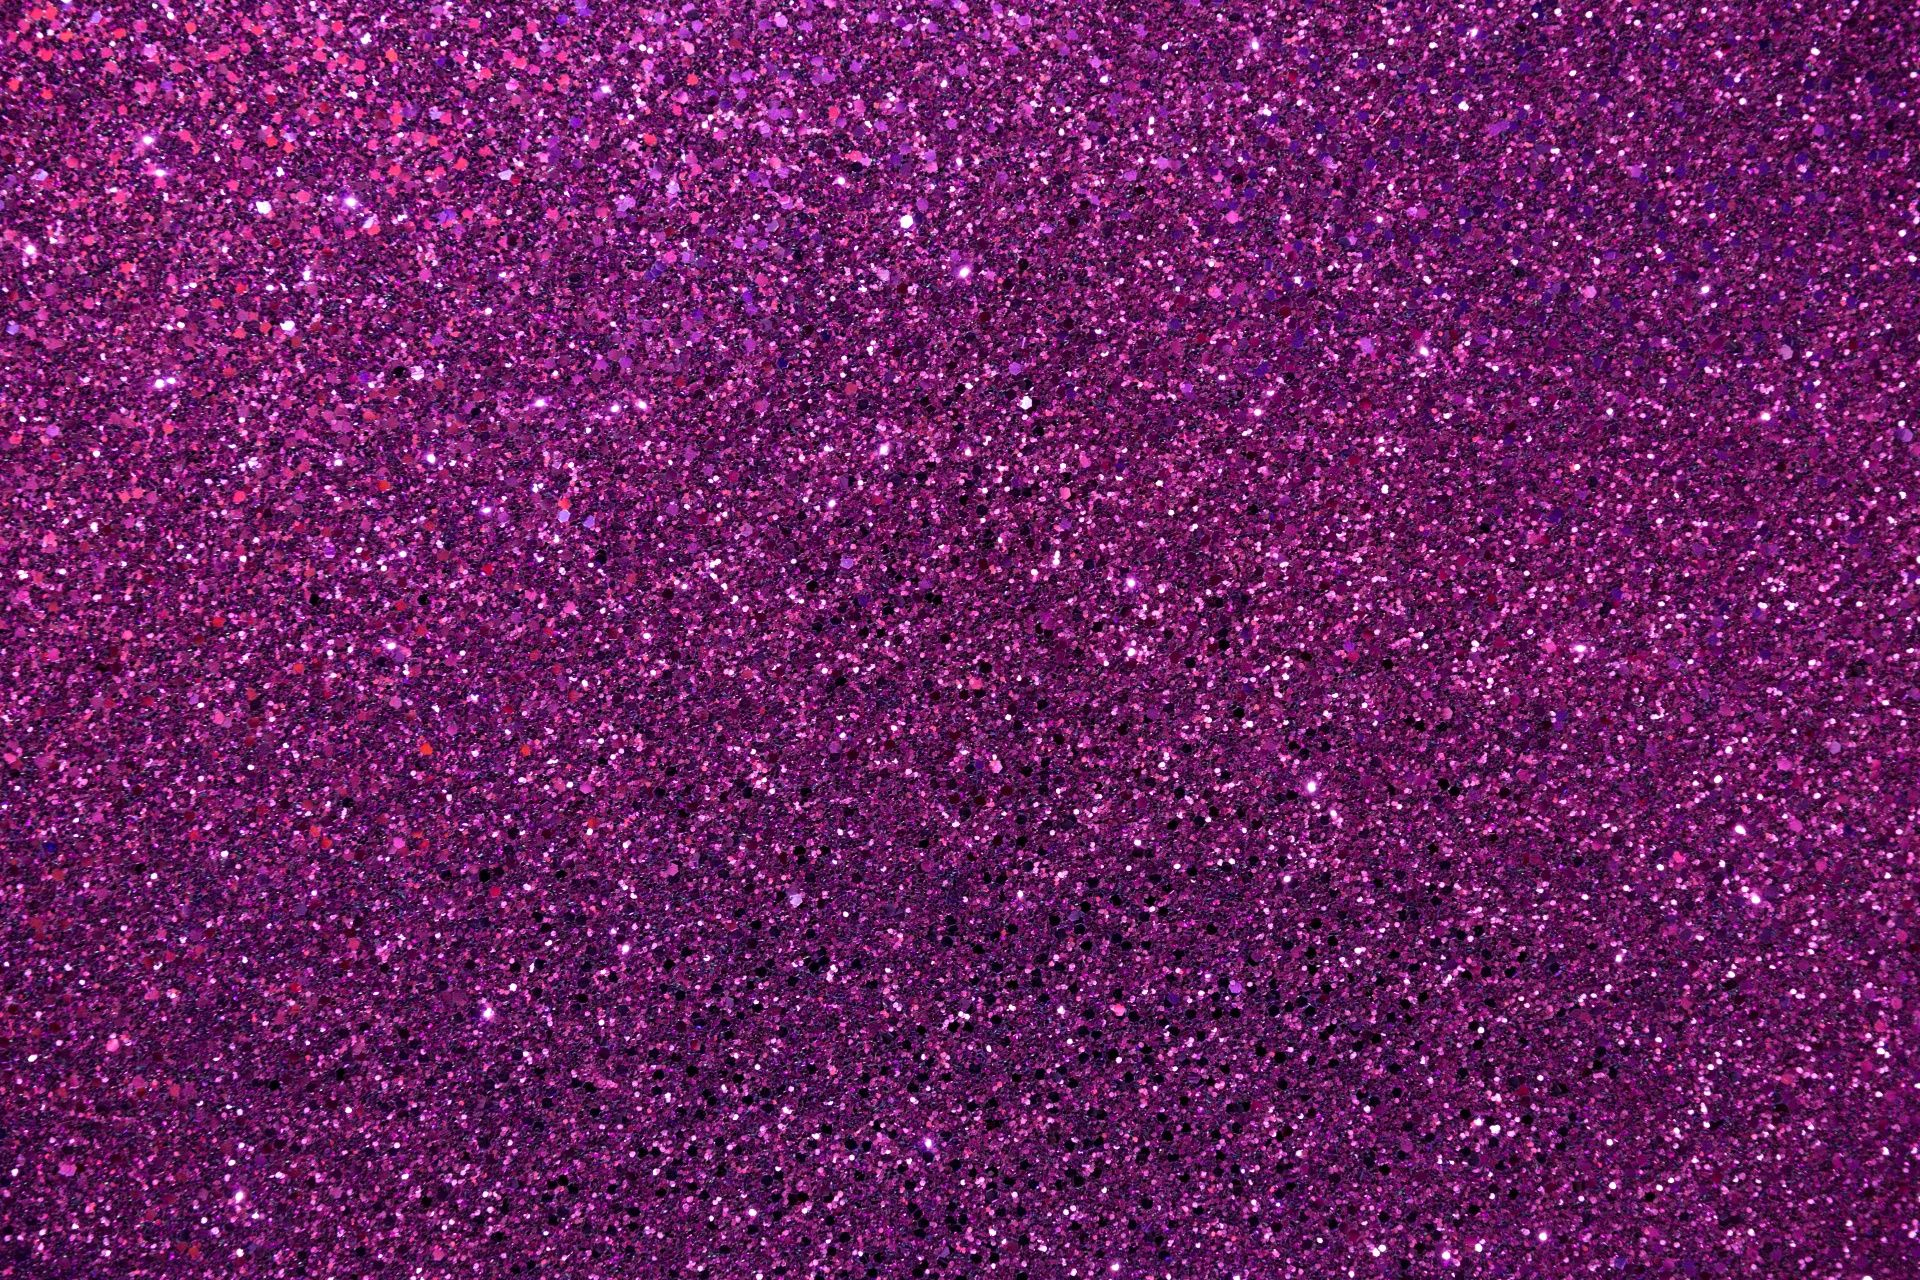 Purple Glitter Background Free Stock Photo Public Domain